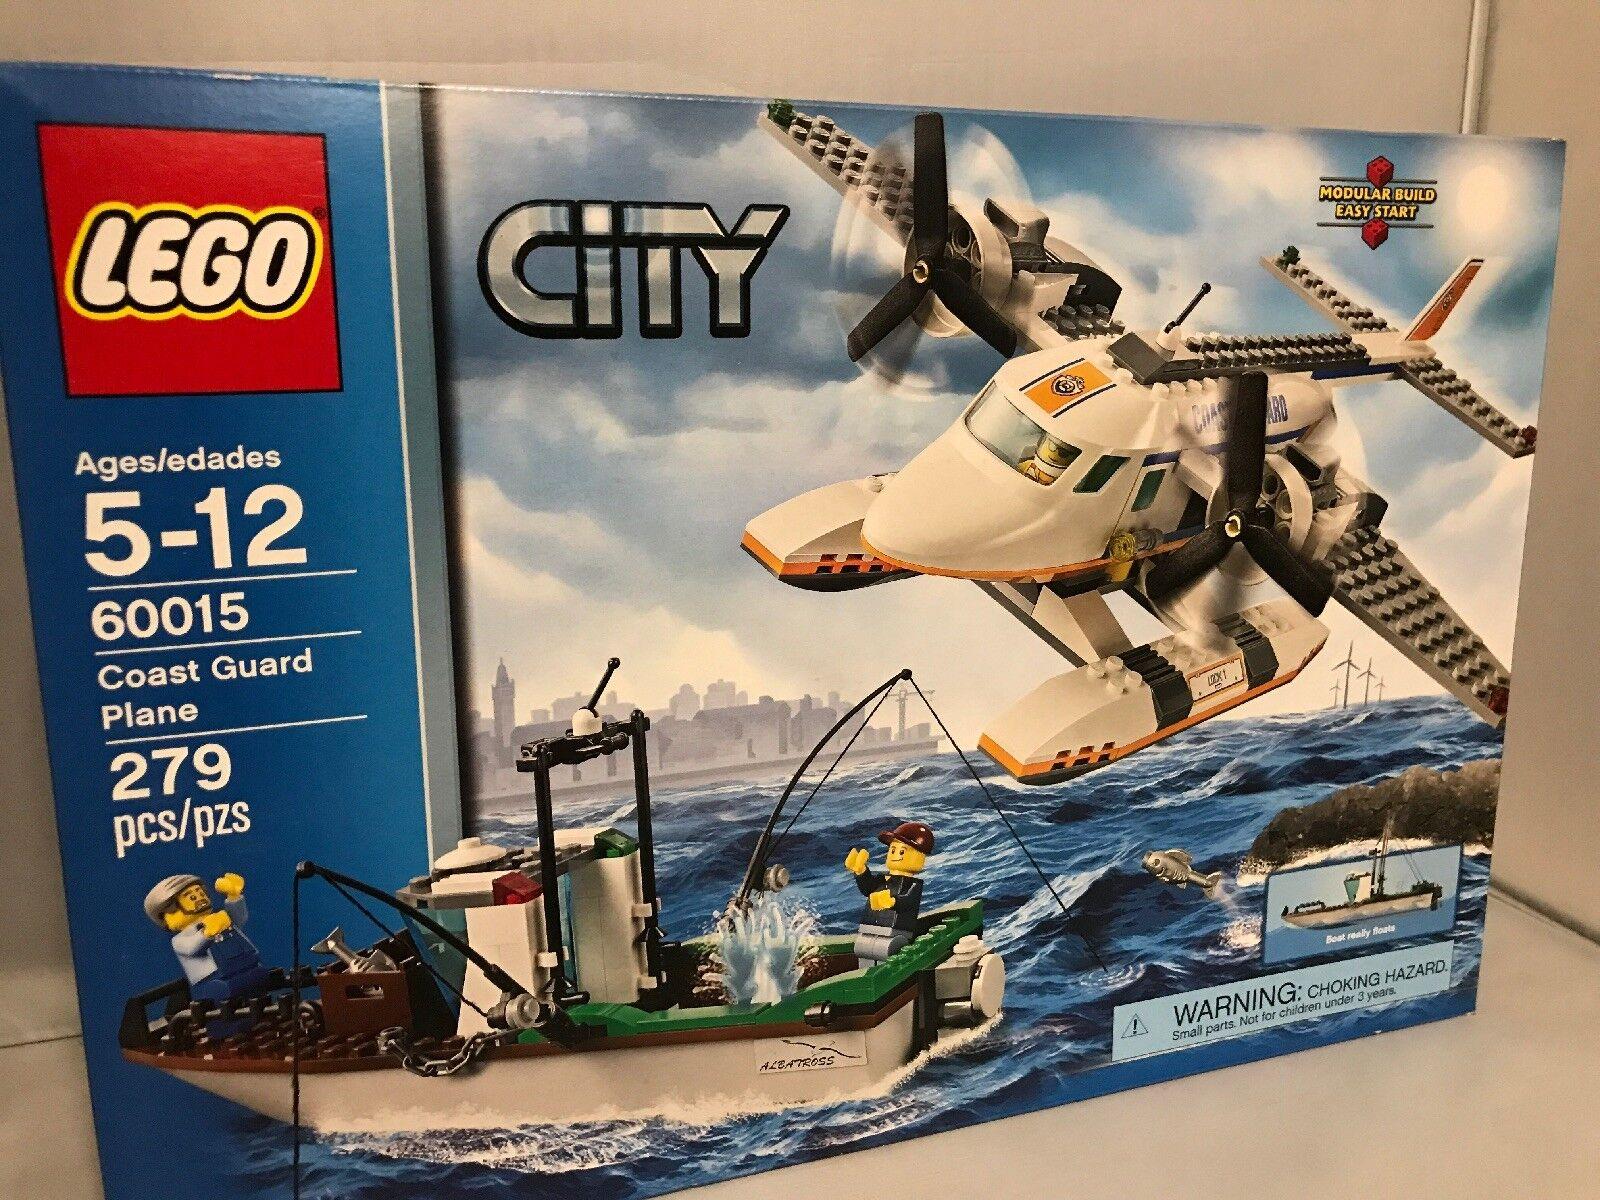 Lego City Coast Guard Plane PCS.